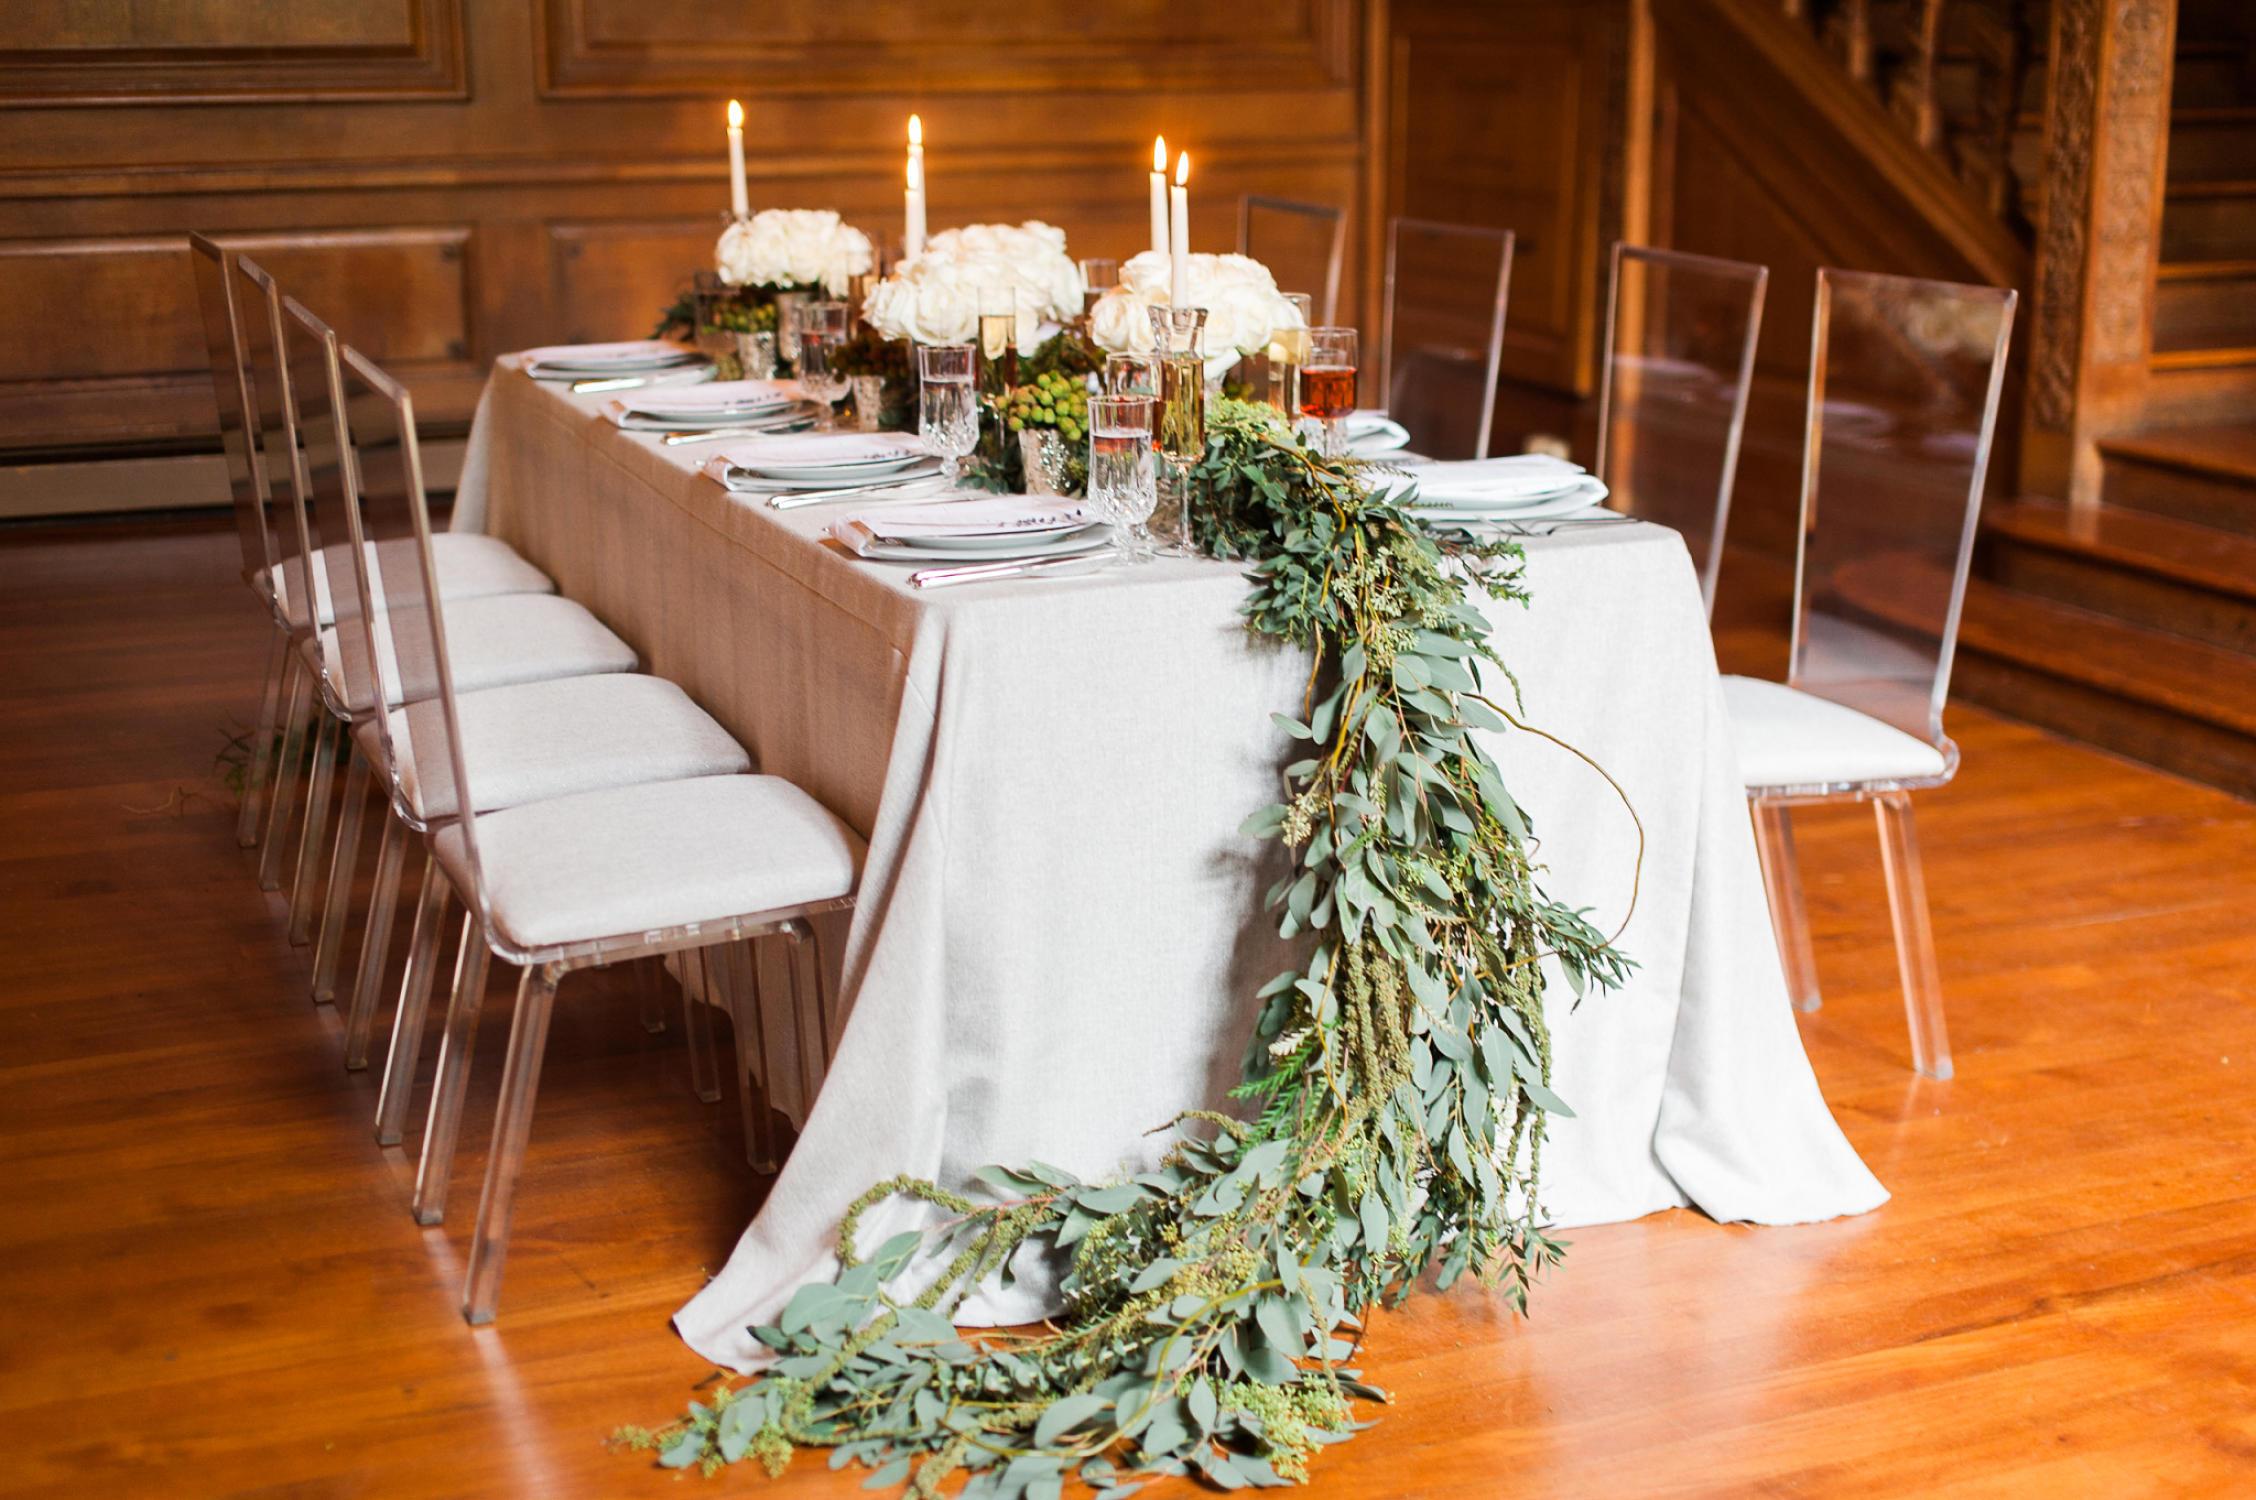 winter-glitz-wedding-inspiration-dane-estate-daylynn-designs16.jpg